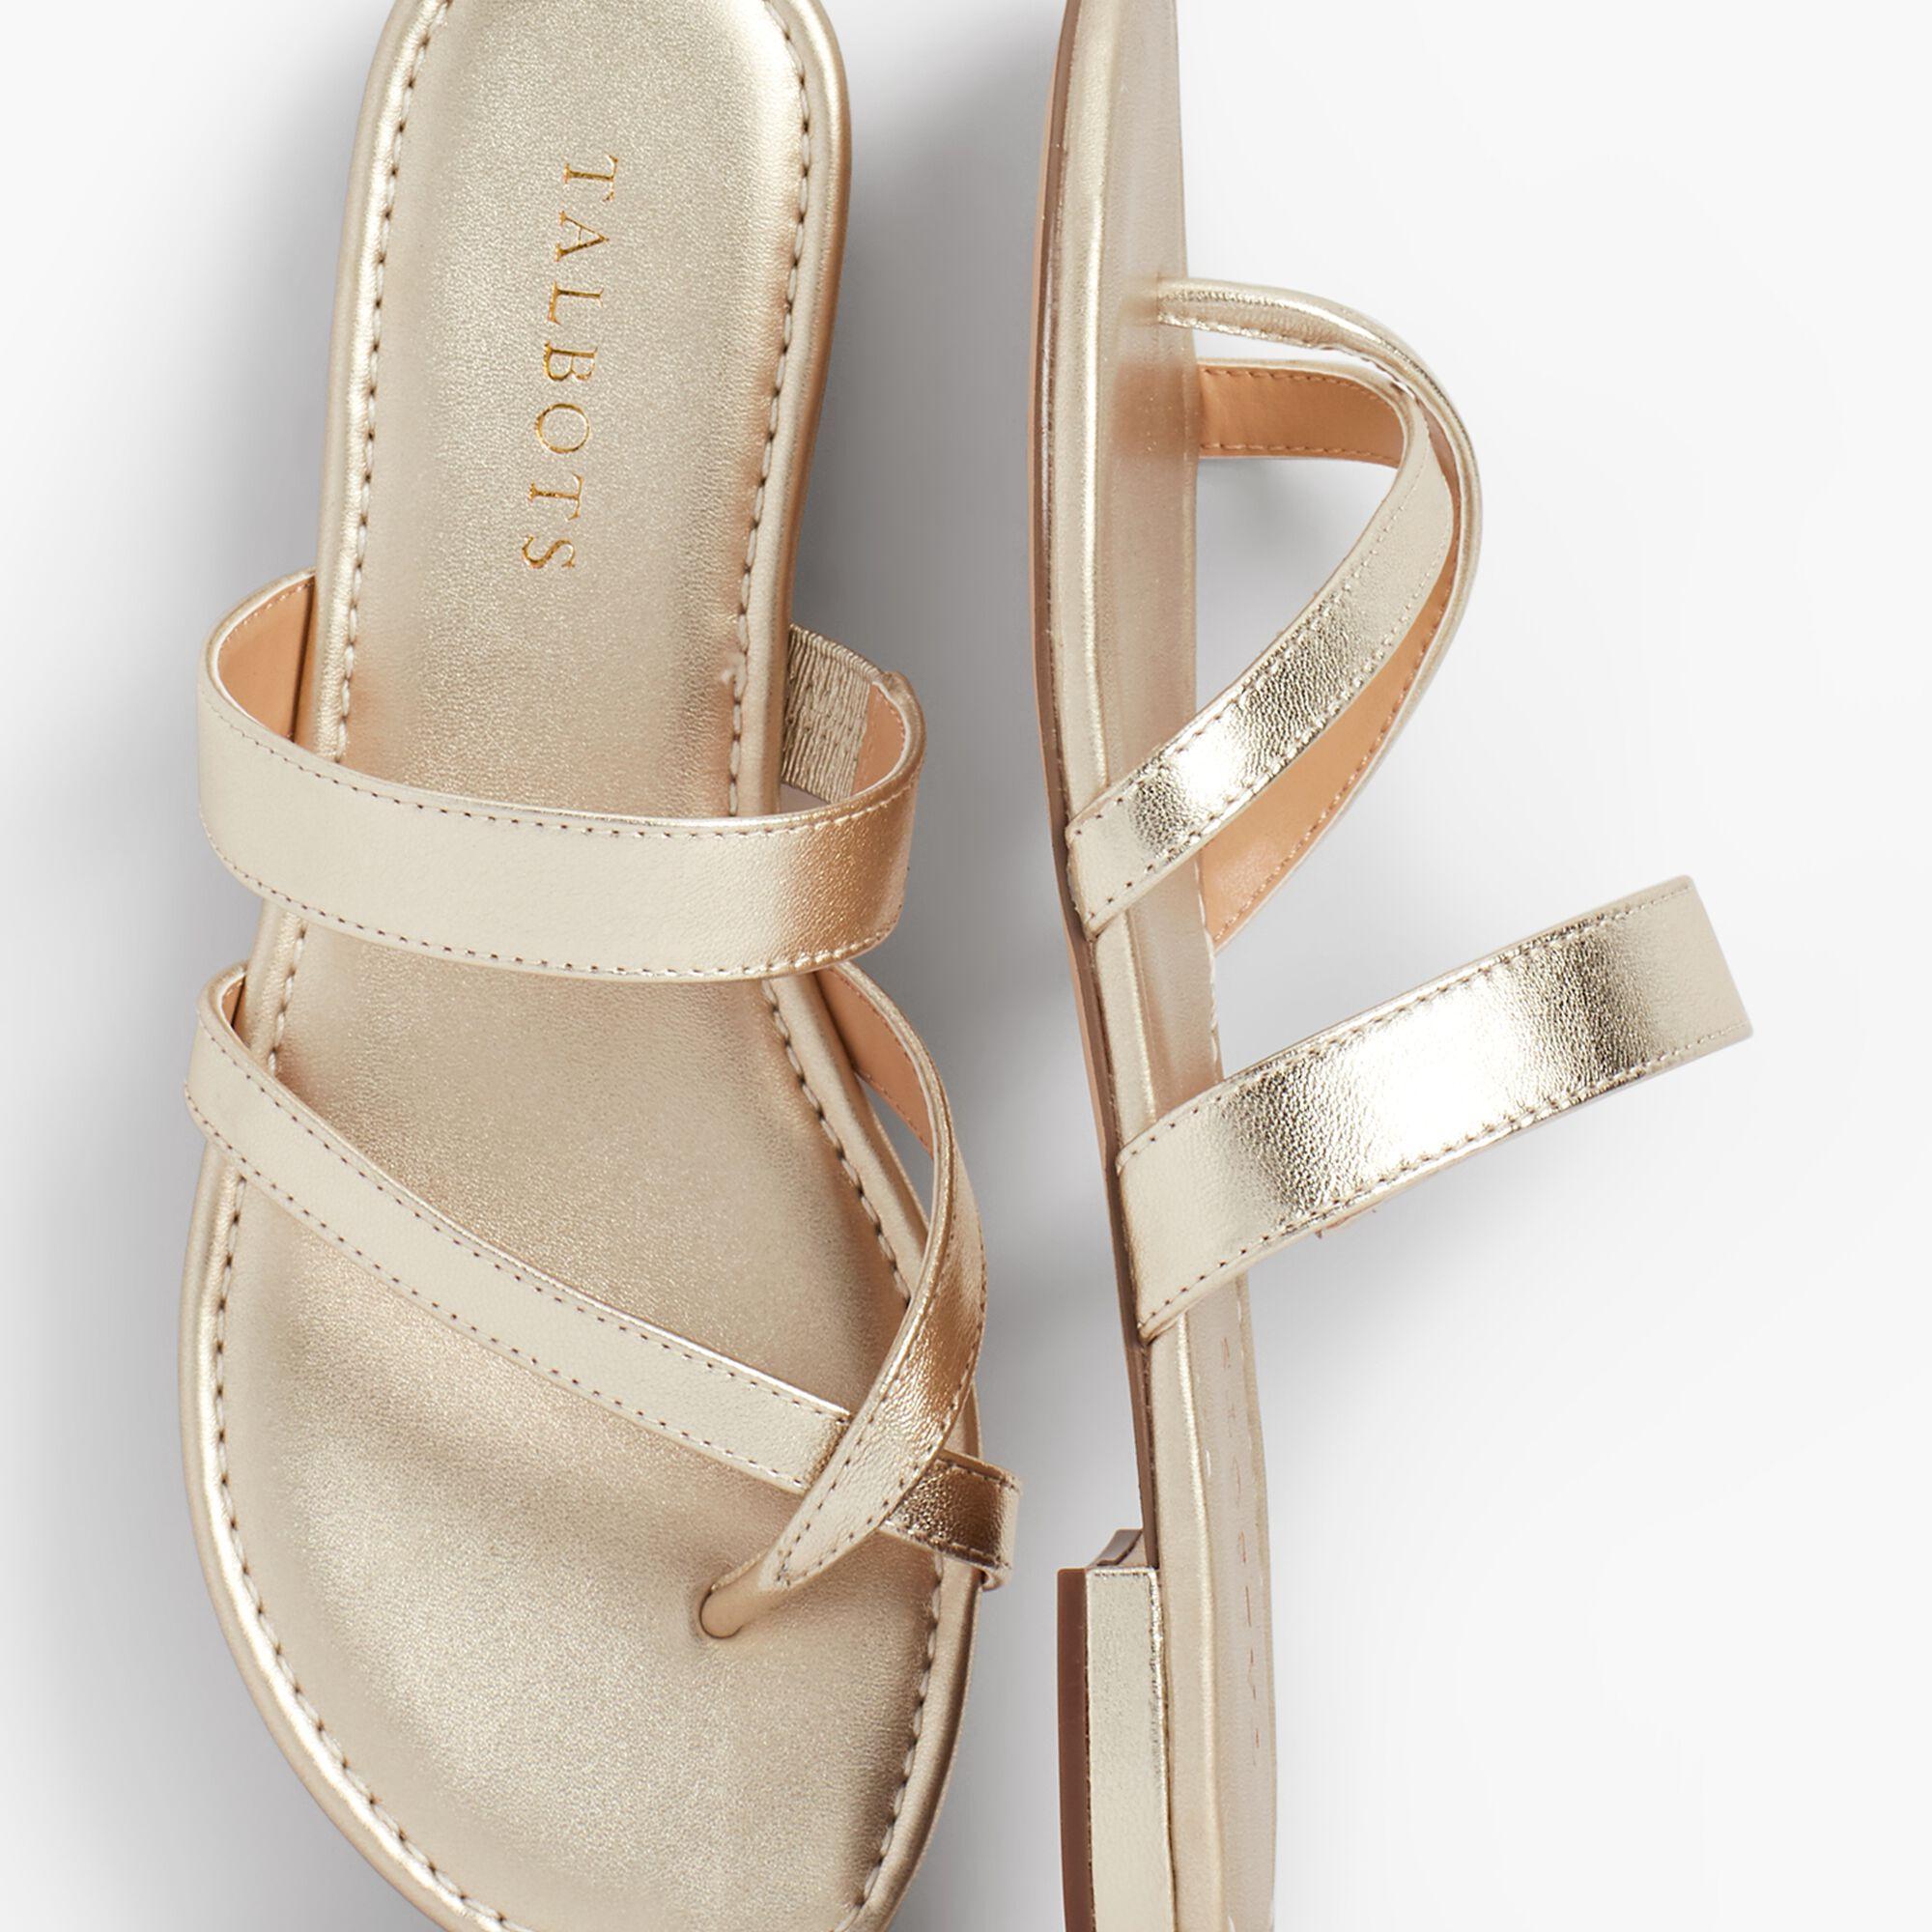 08f959d4da7 Images. Gia Toe-Ring Sandals - Metallic Nappa